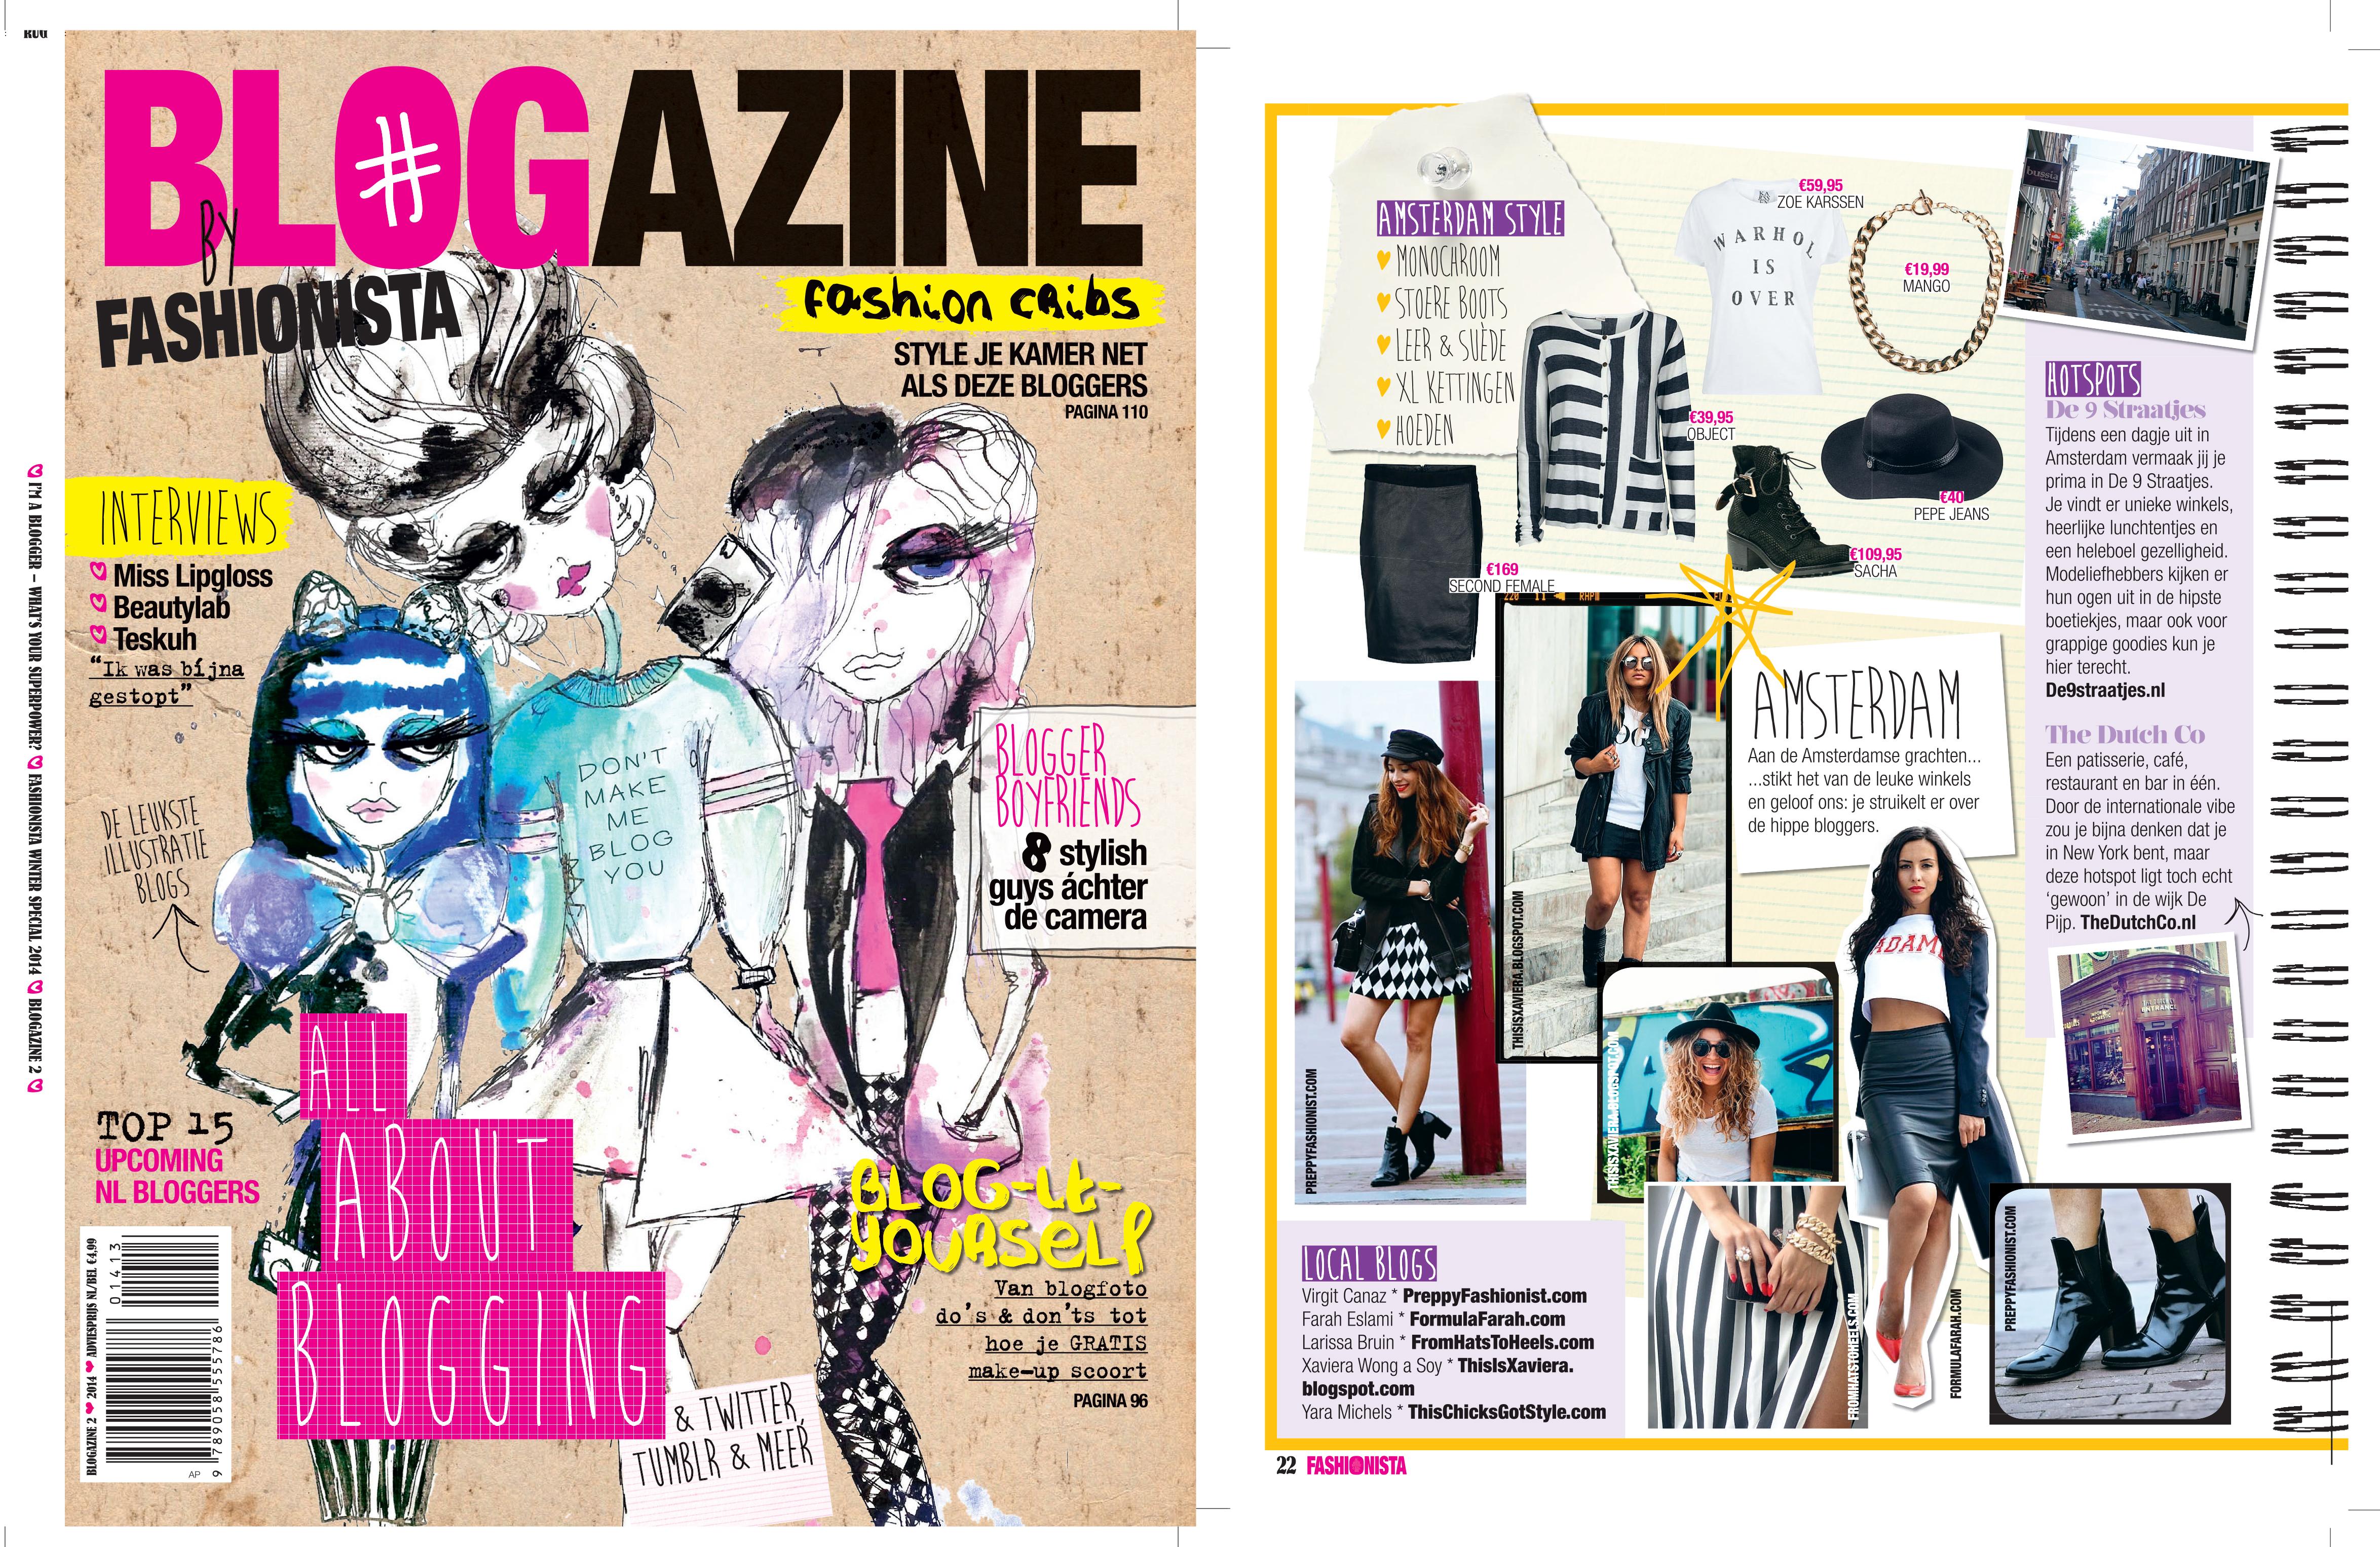 Blogazine Magazine